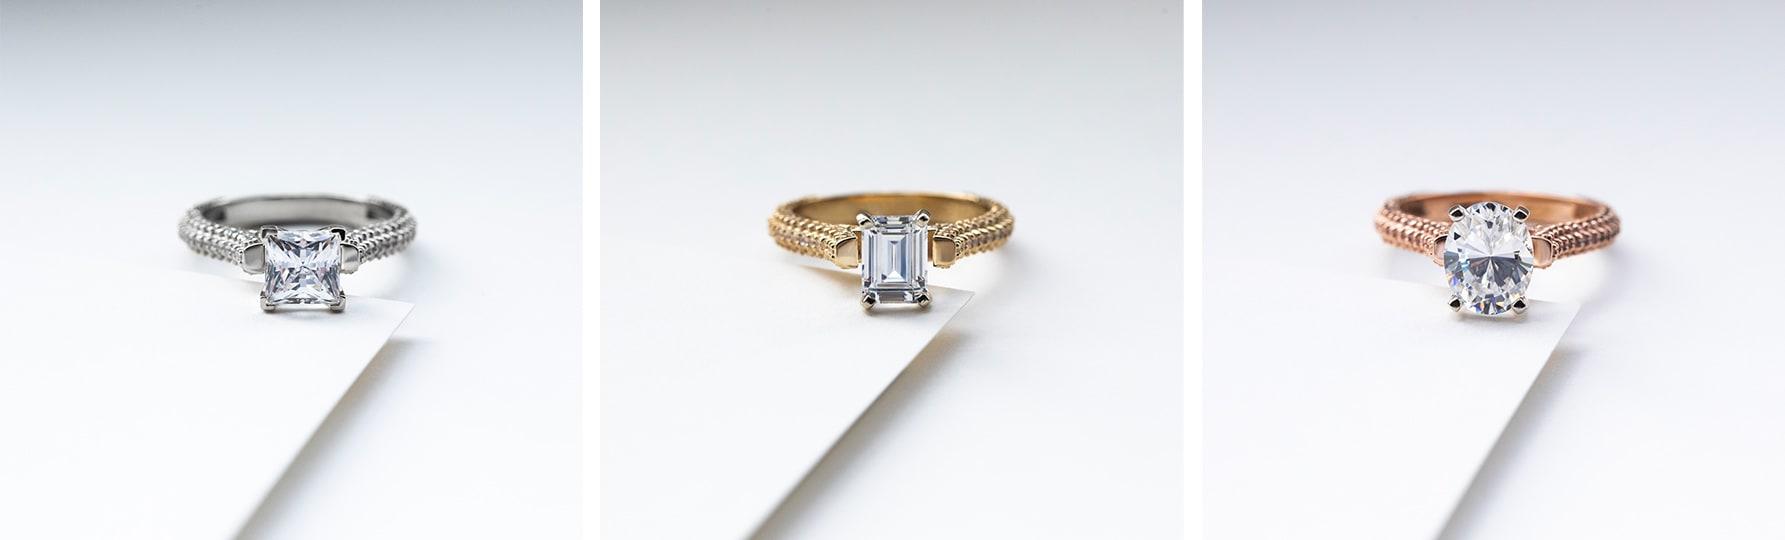 A princess cut pave engagement ring